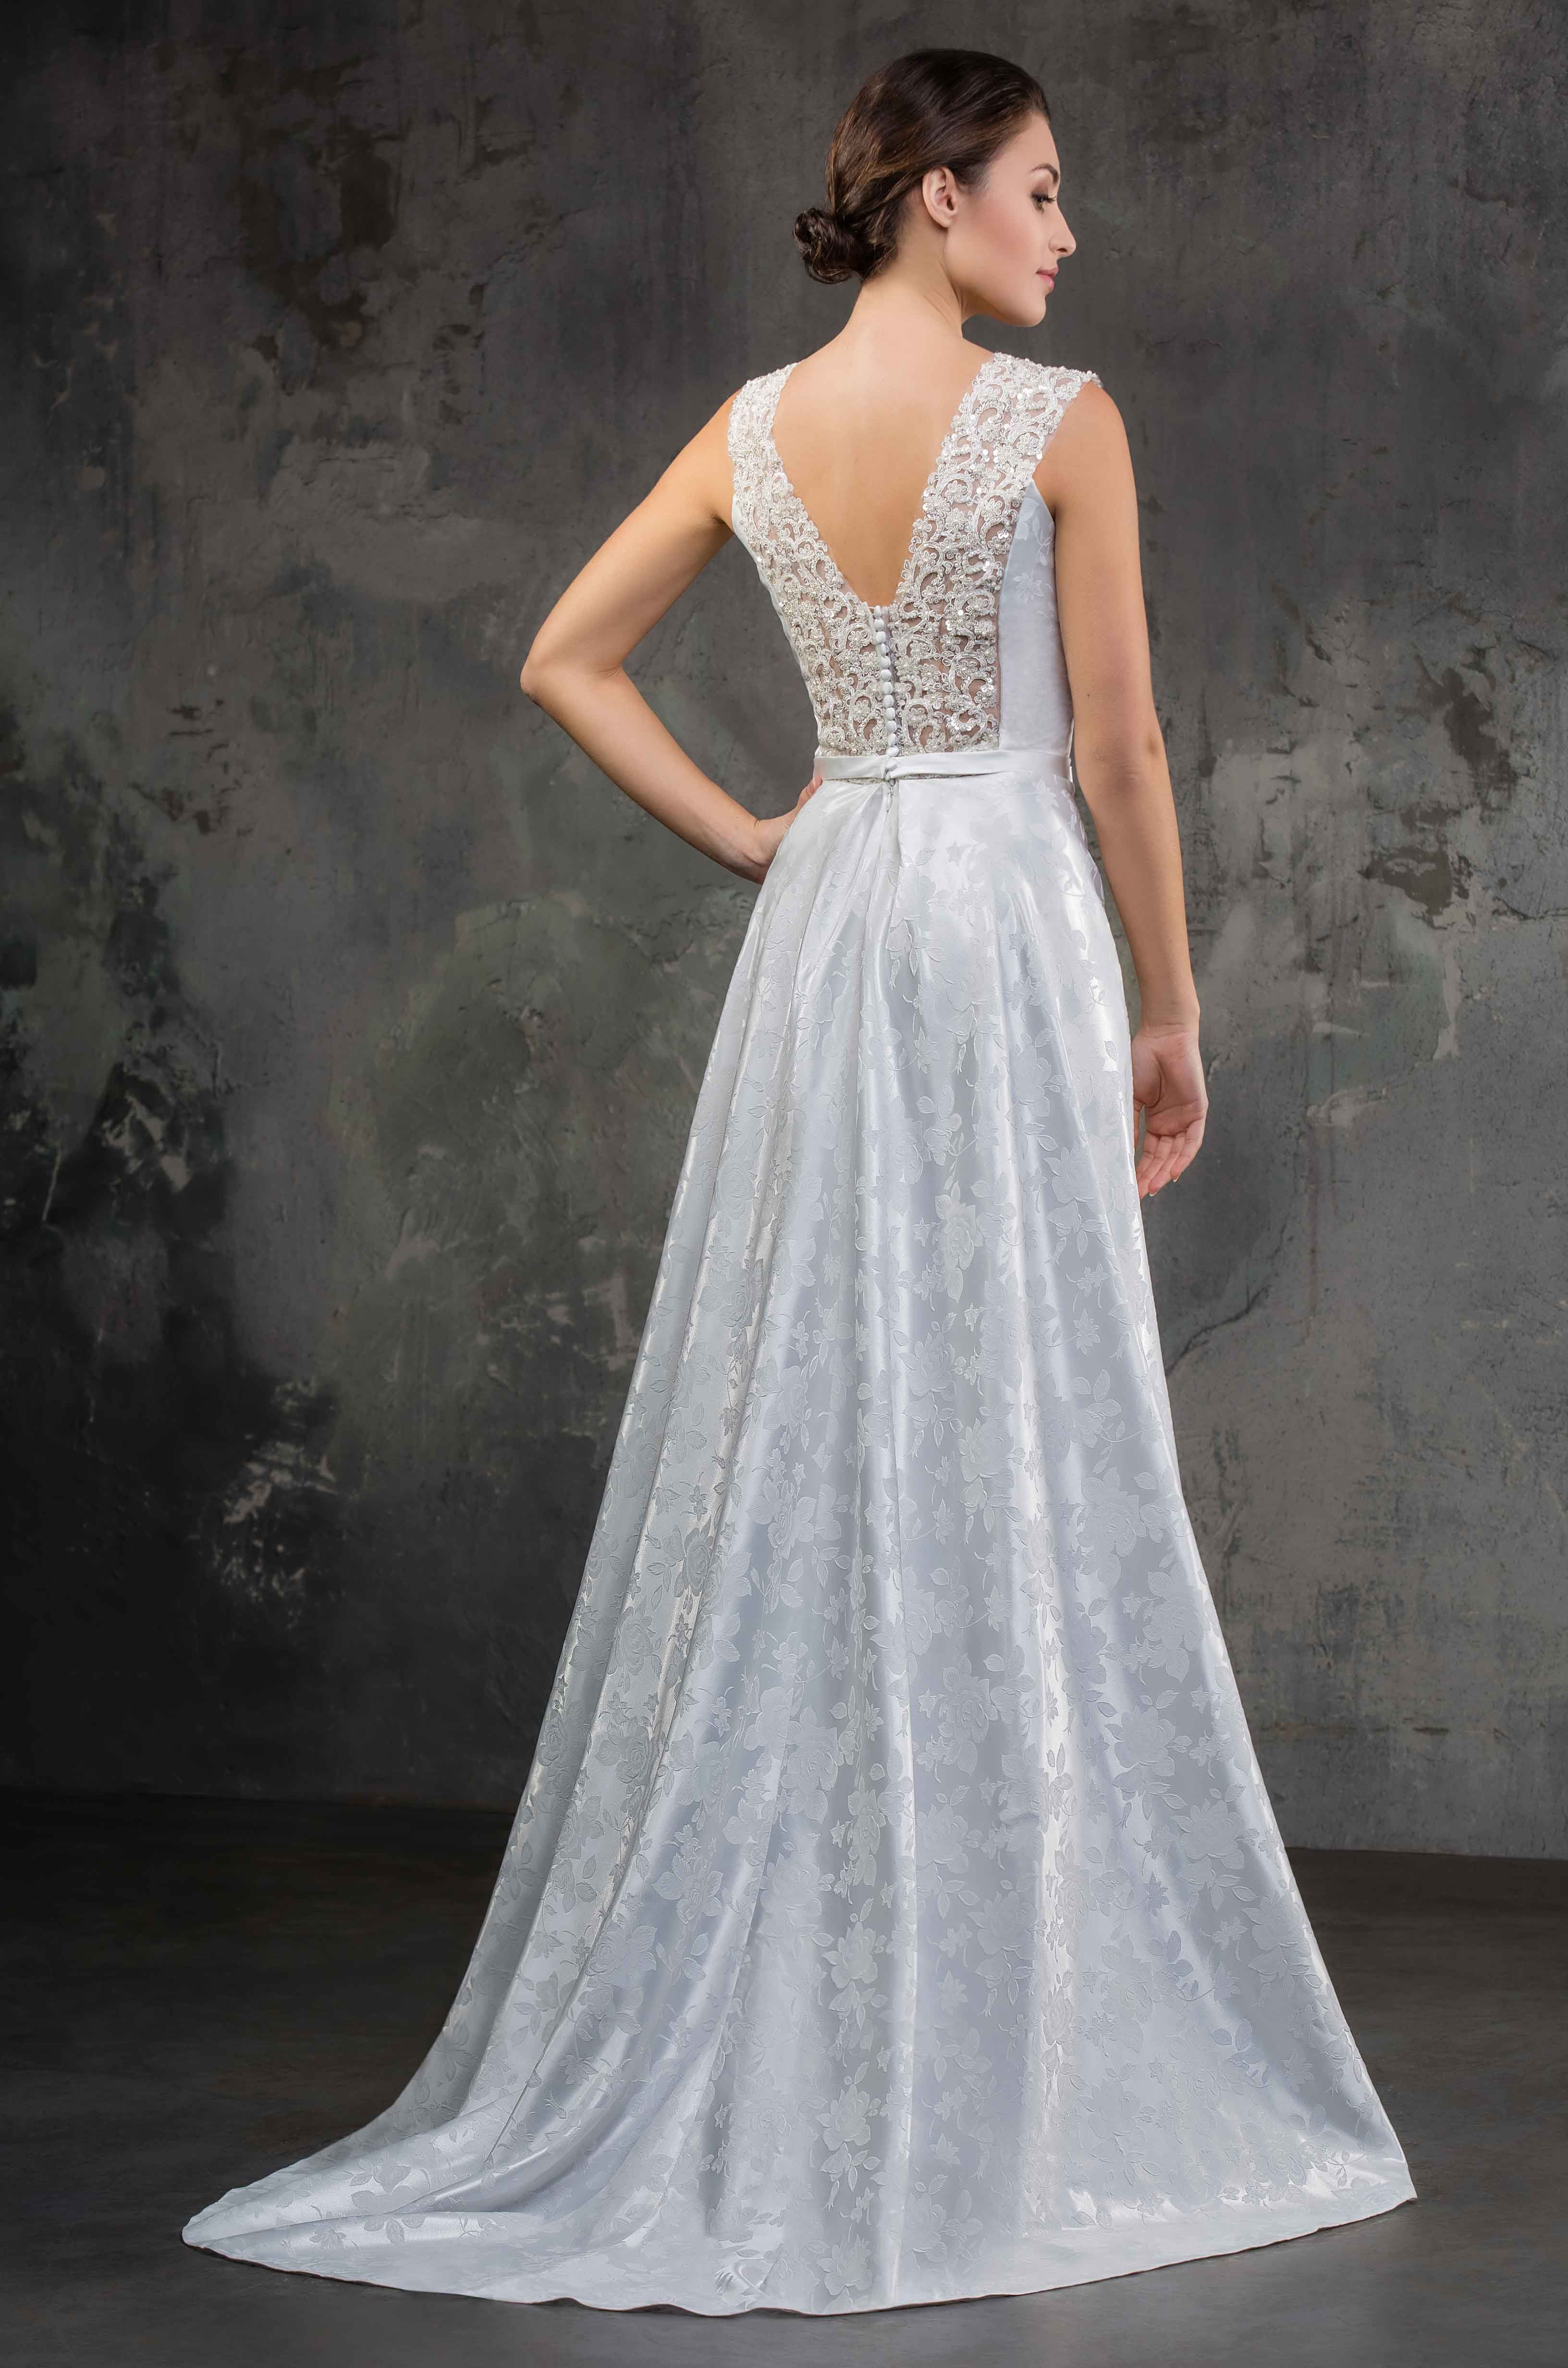 Wedding Dress With Lace Back Wedding Rustic And Boho Dress Short Shoulders Glam Fashion Bridesmai Wedding Dresses Lace Boho Dress Lace Dress [ 4928 x 3264 Pixel ]